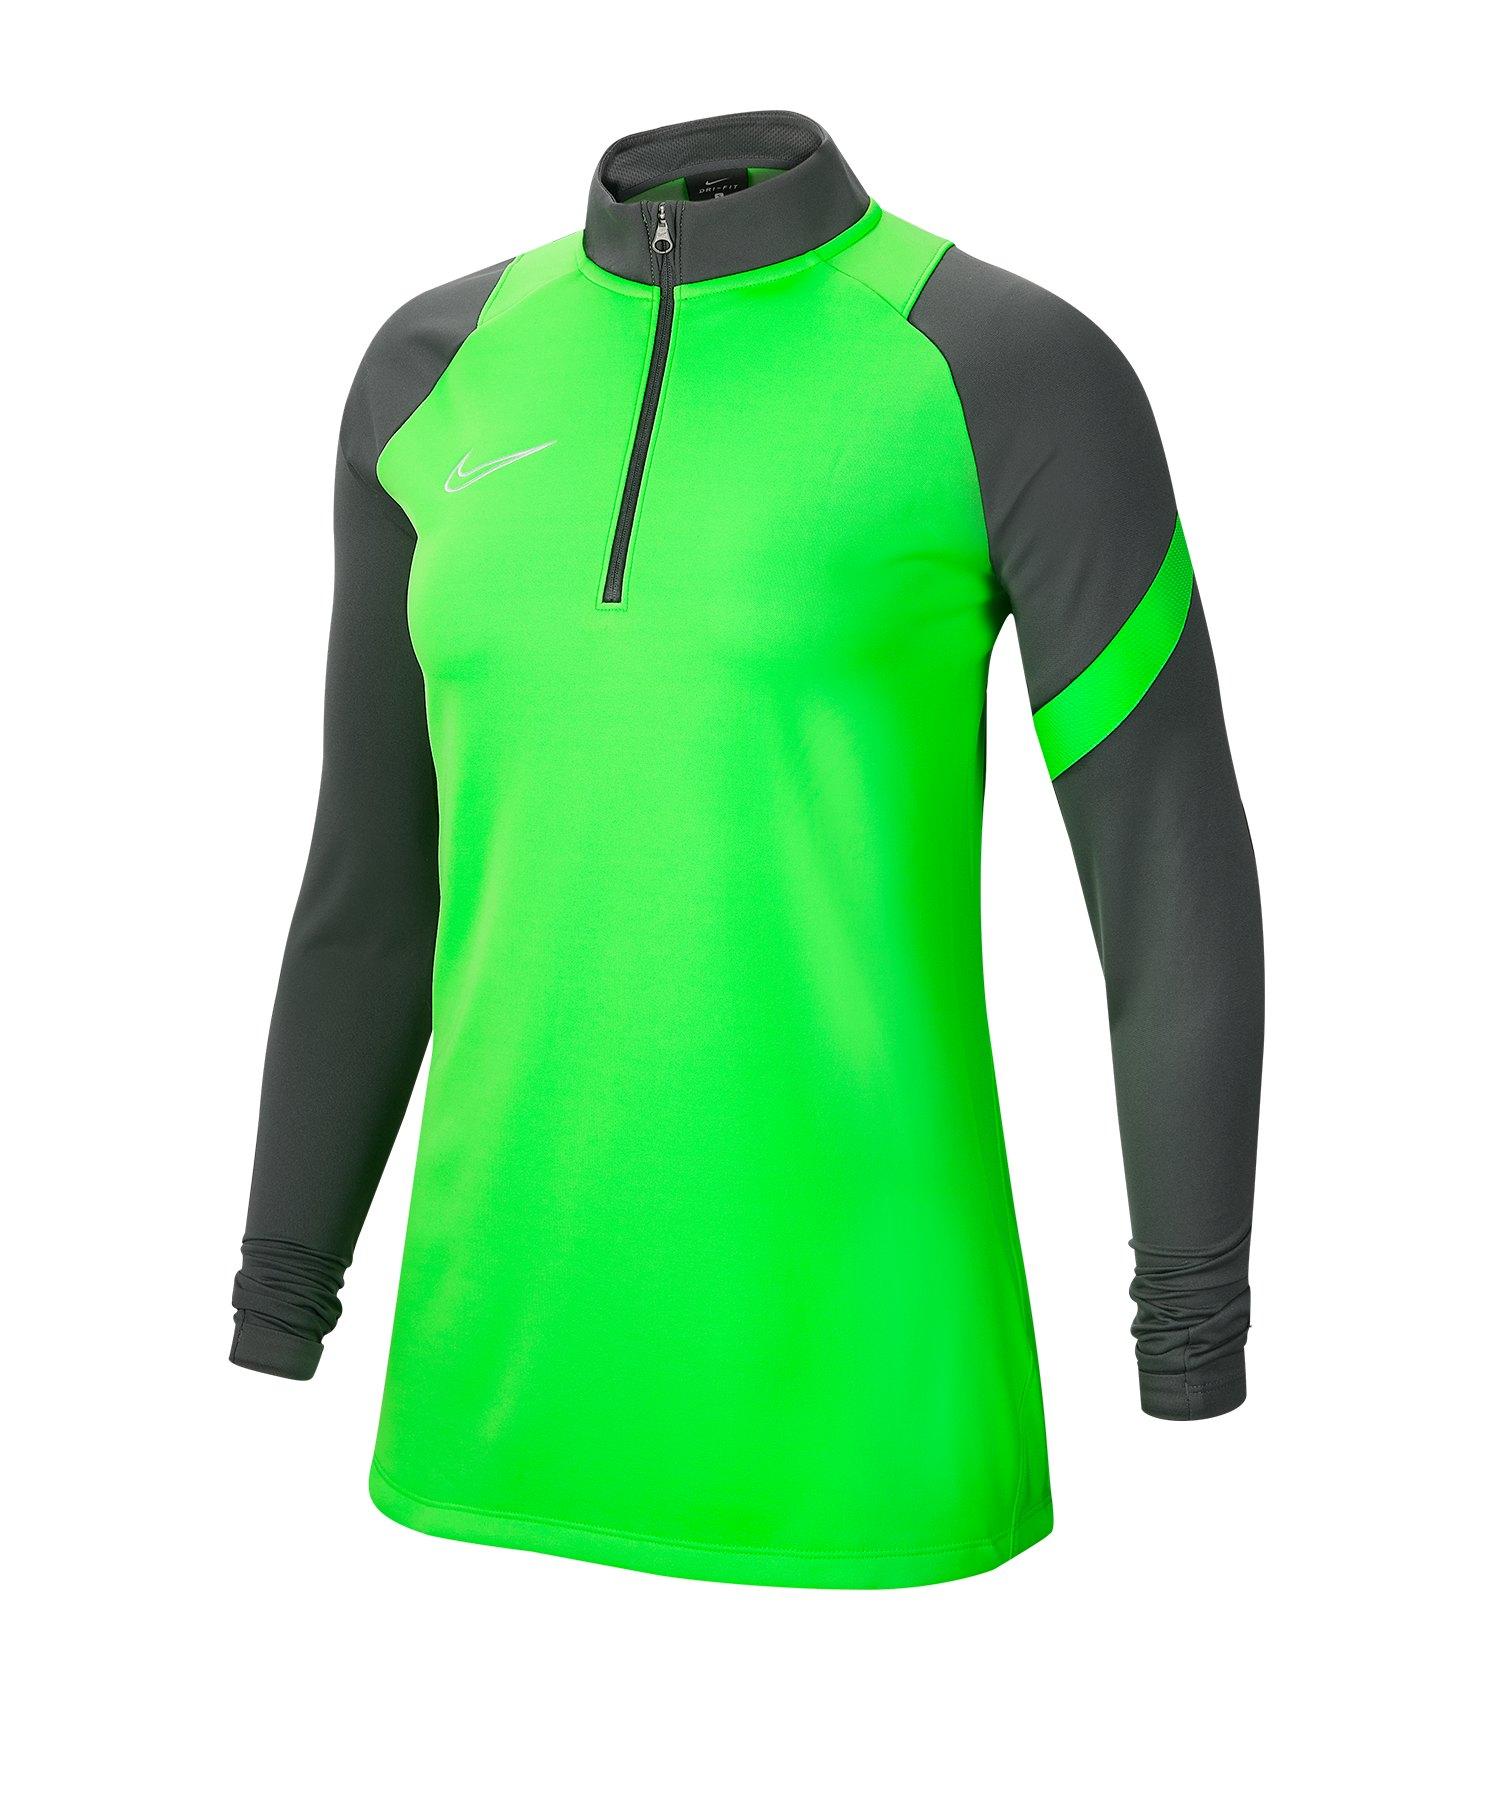 Nike Academy Pro Sweatshirt Damen Grün F398 - gruen